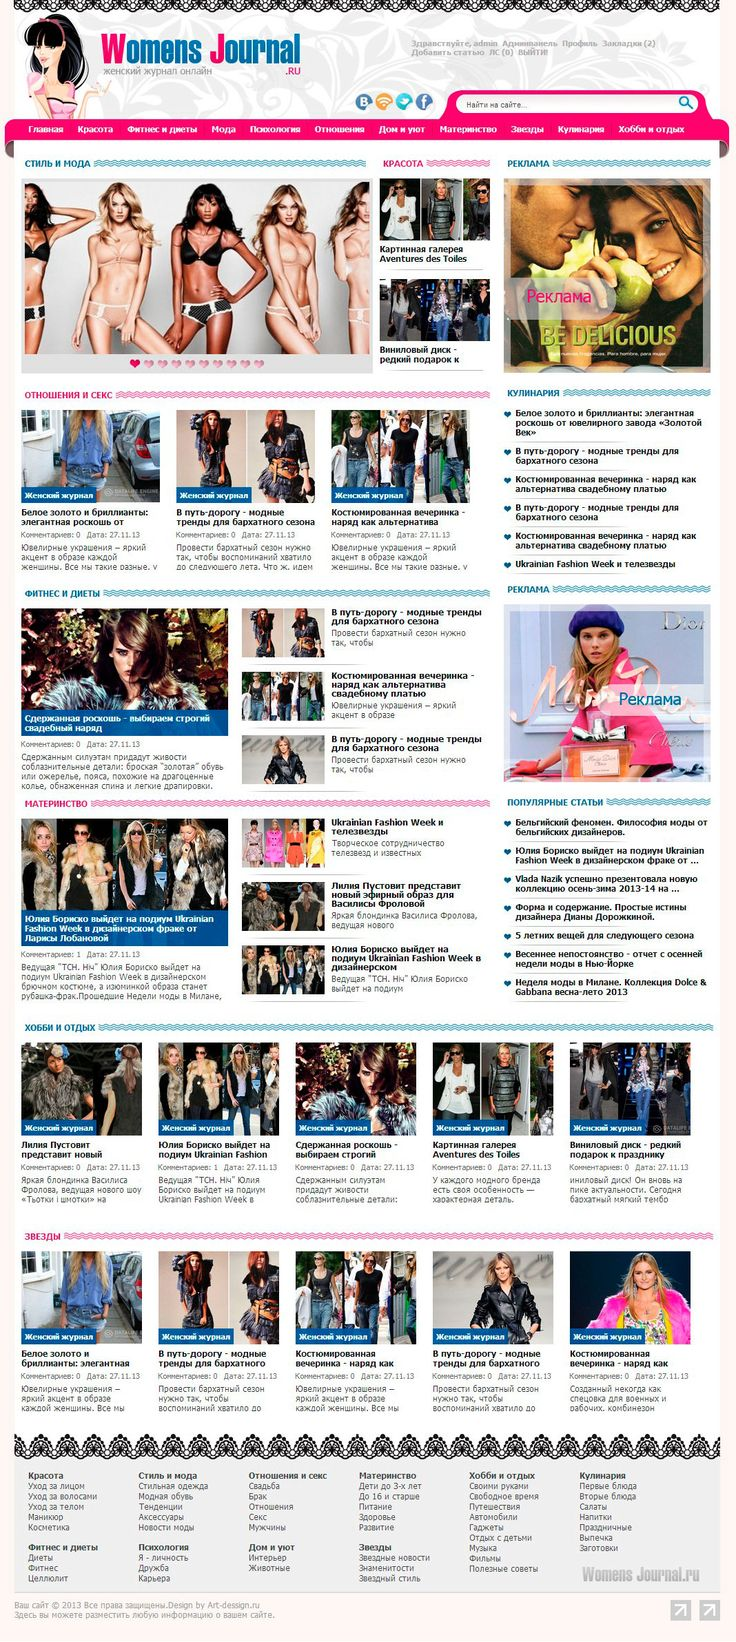 Womens Journal - красивый женский шаблон для DLE #templates #website #шаблон #сайт #web